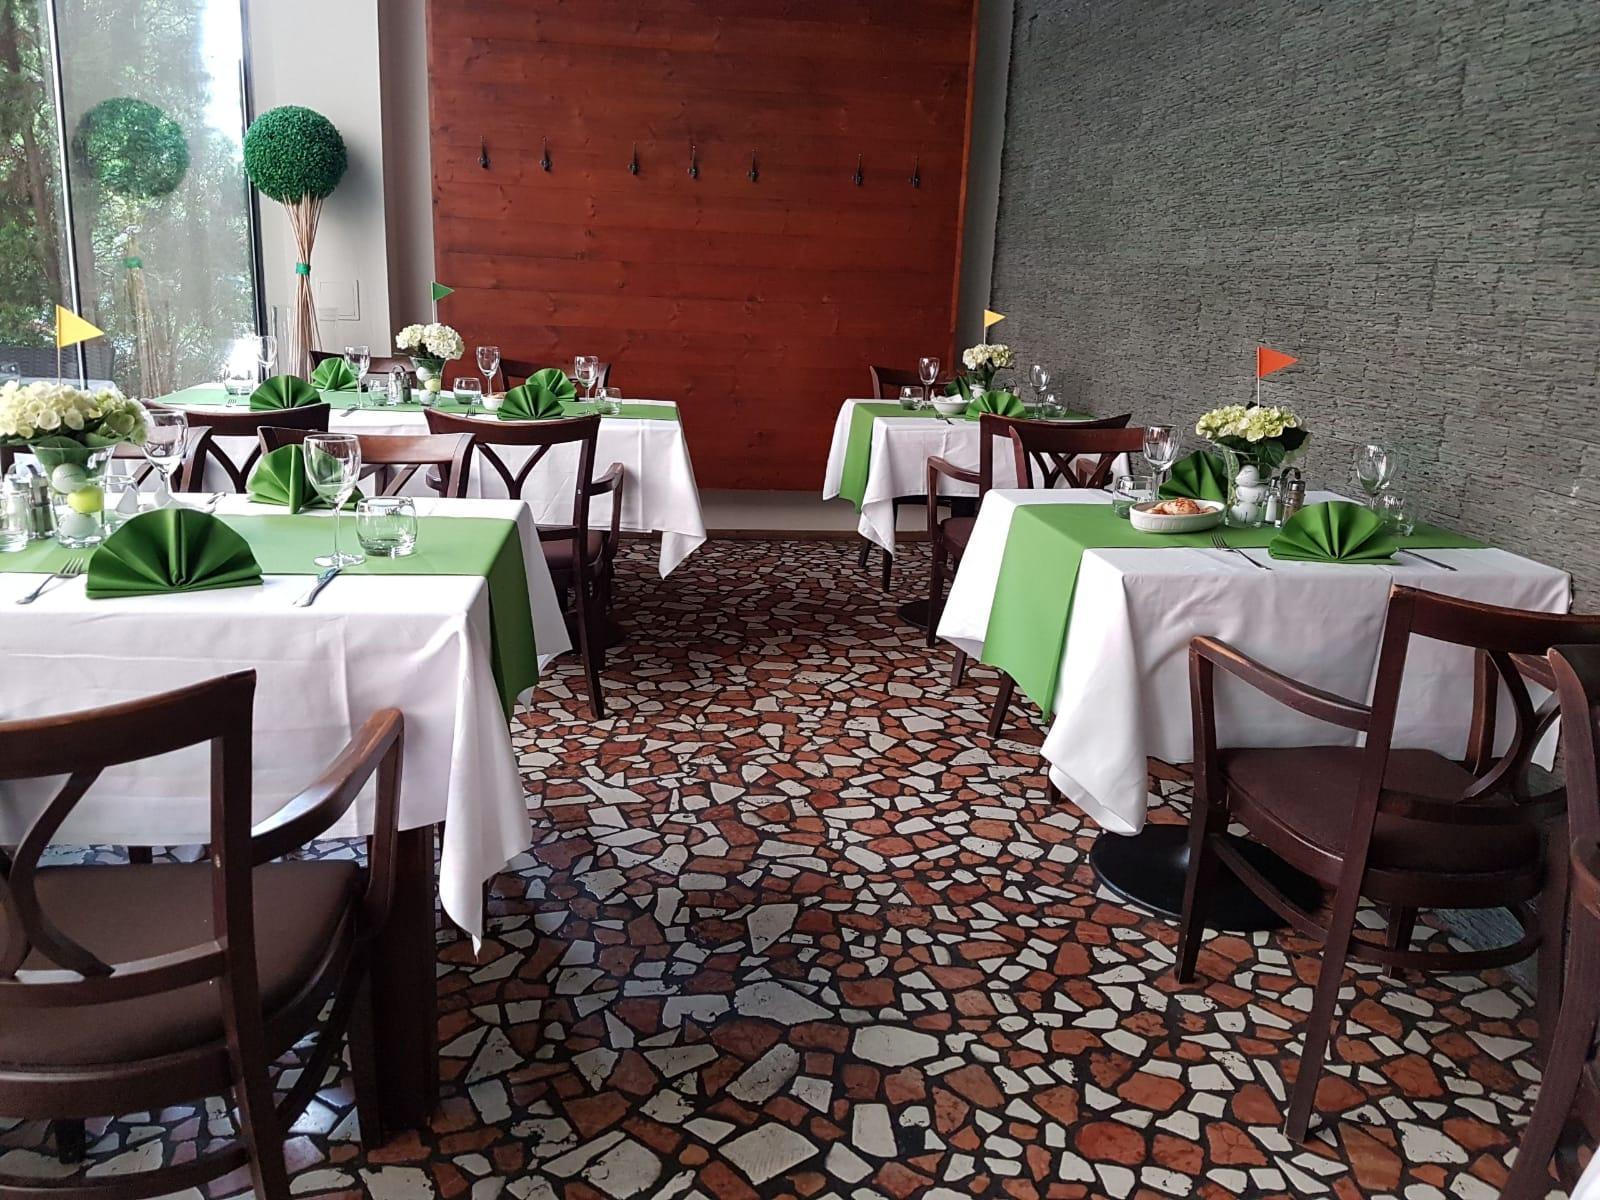 Reštaurácia Four 4in - Obrázok č. 2